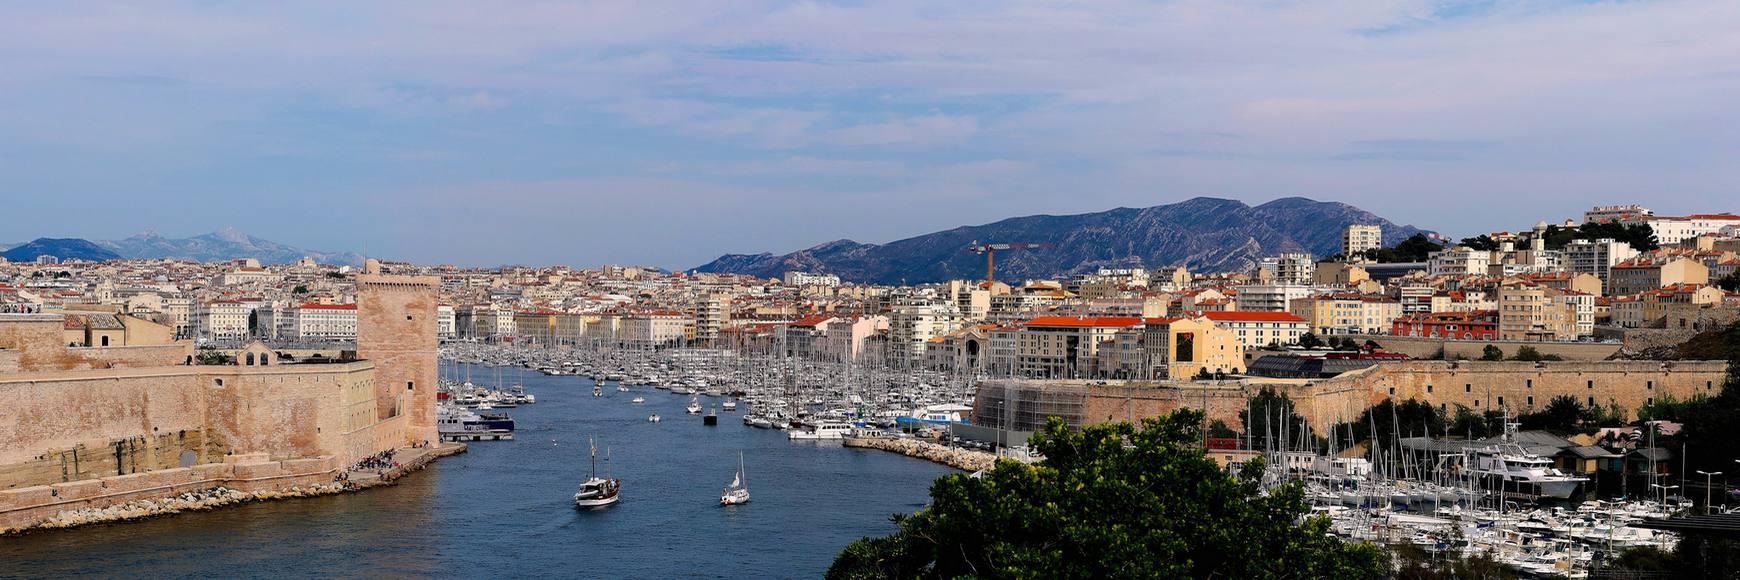 Location catamaran France Méditerranée